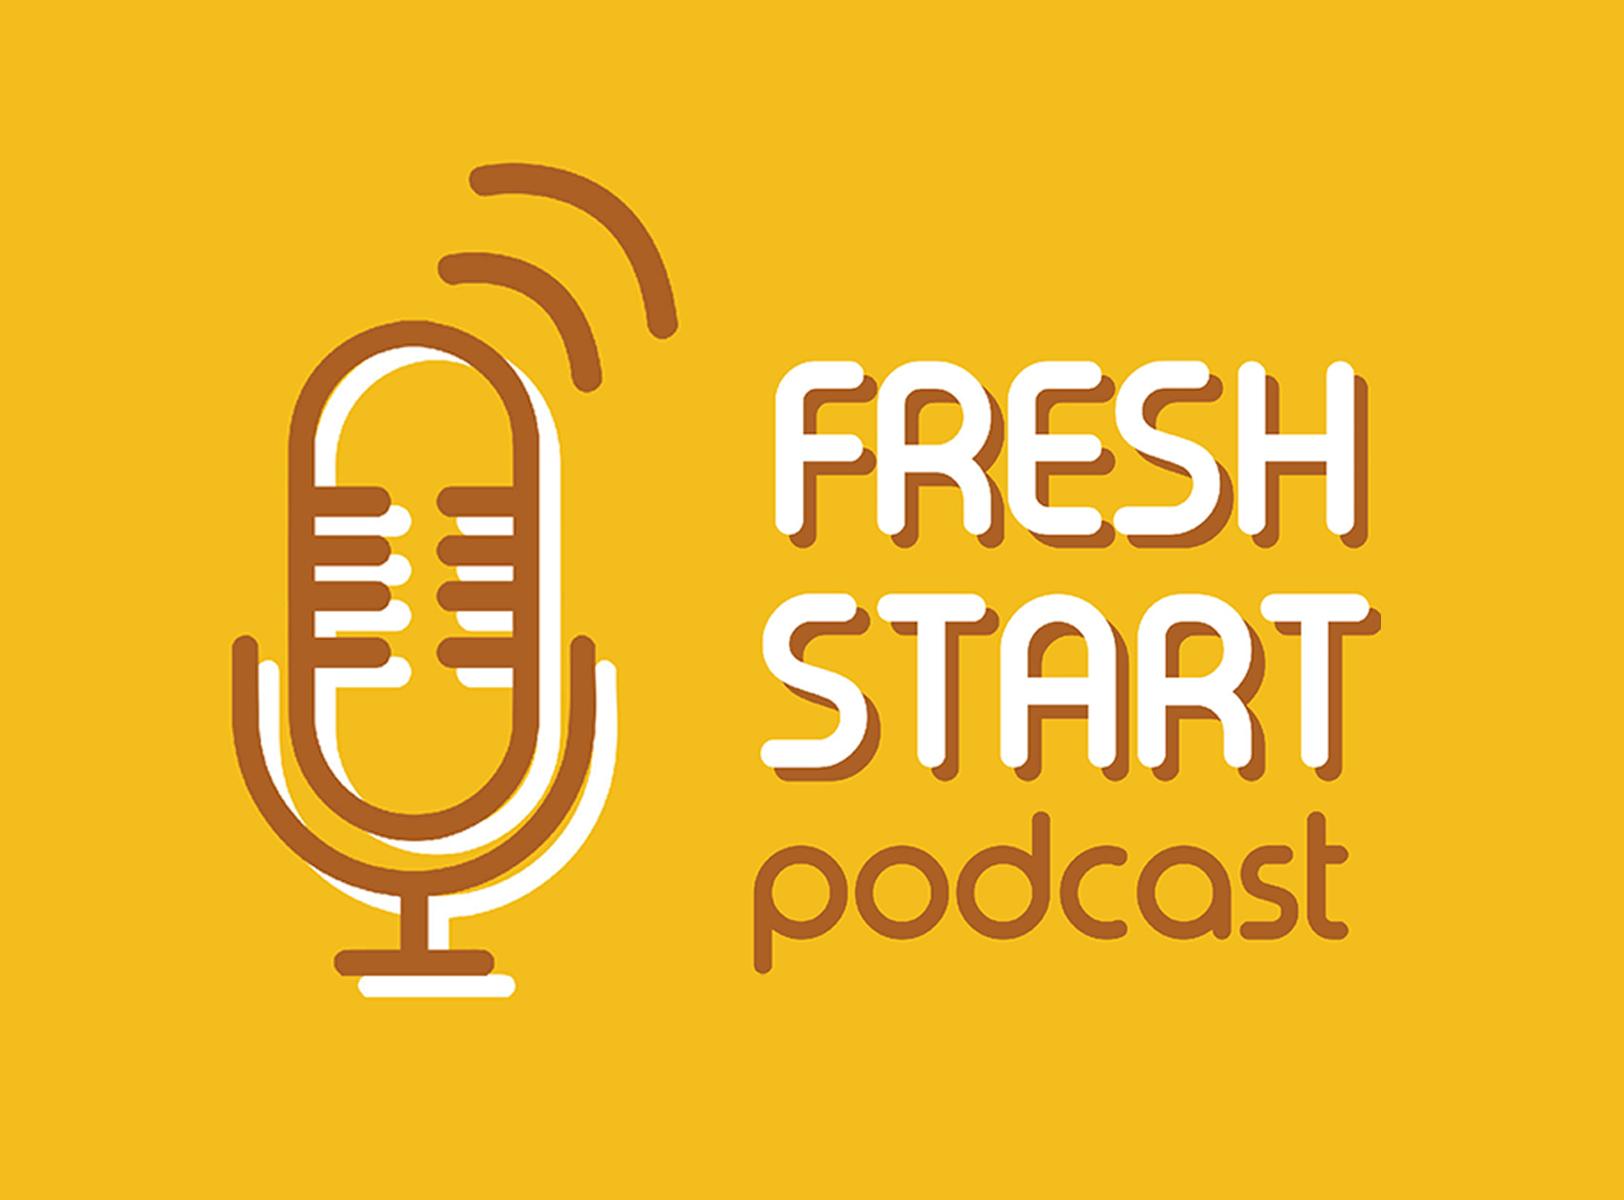 Fresh Start: Podcast News (3/26/2019 Tue.)